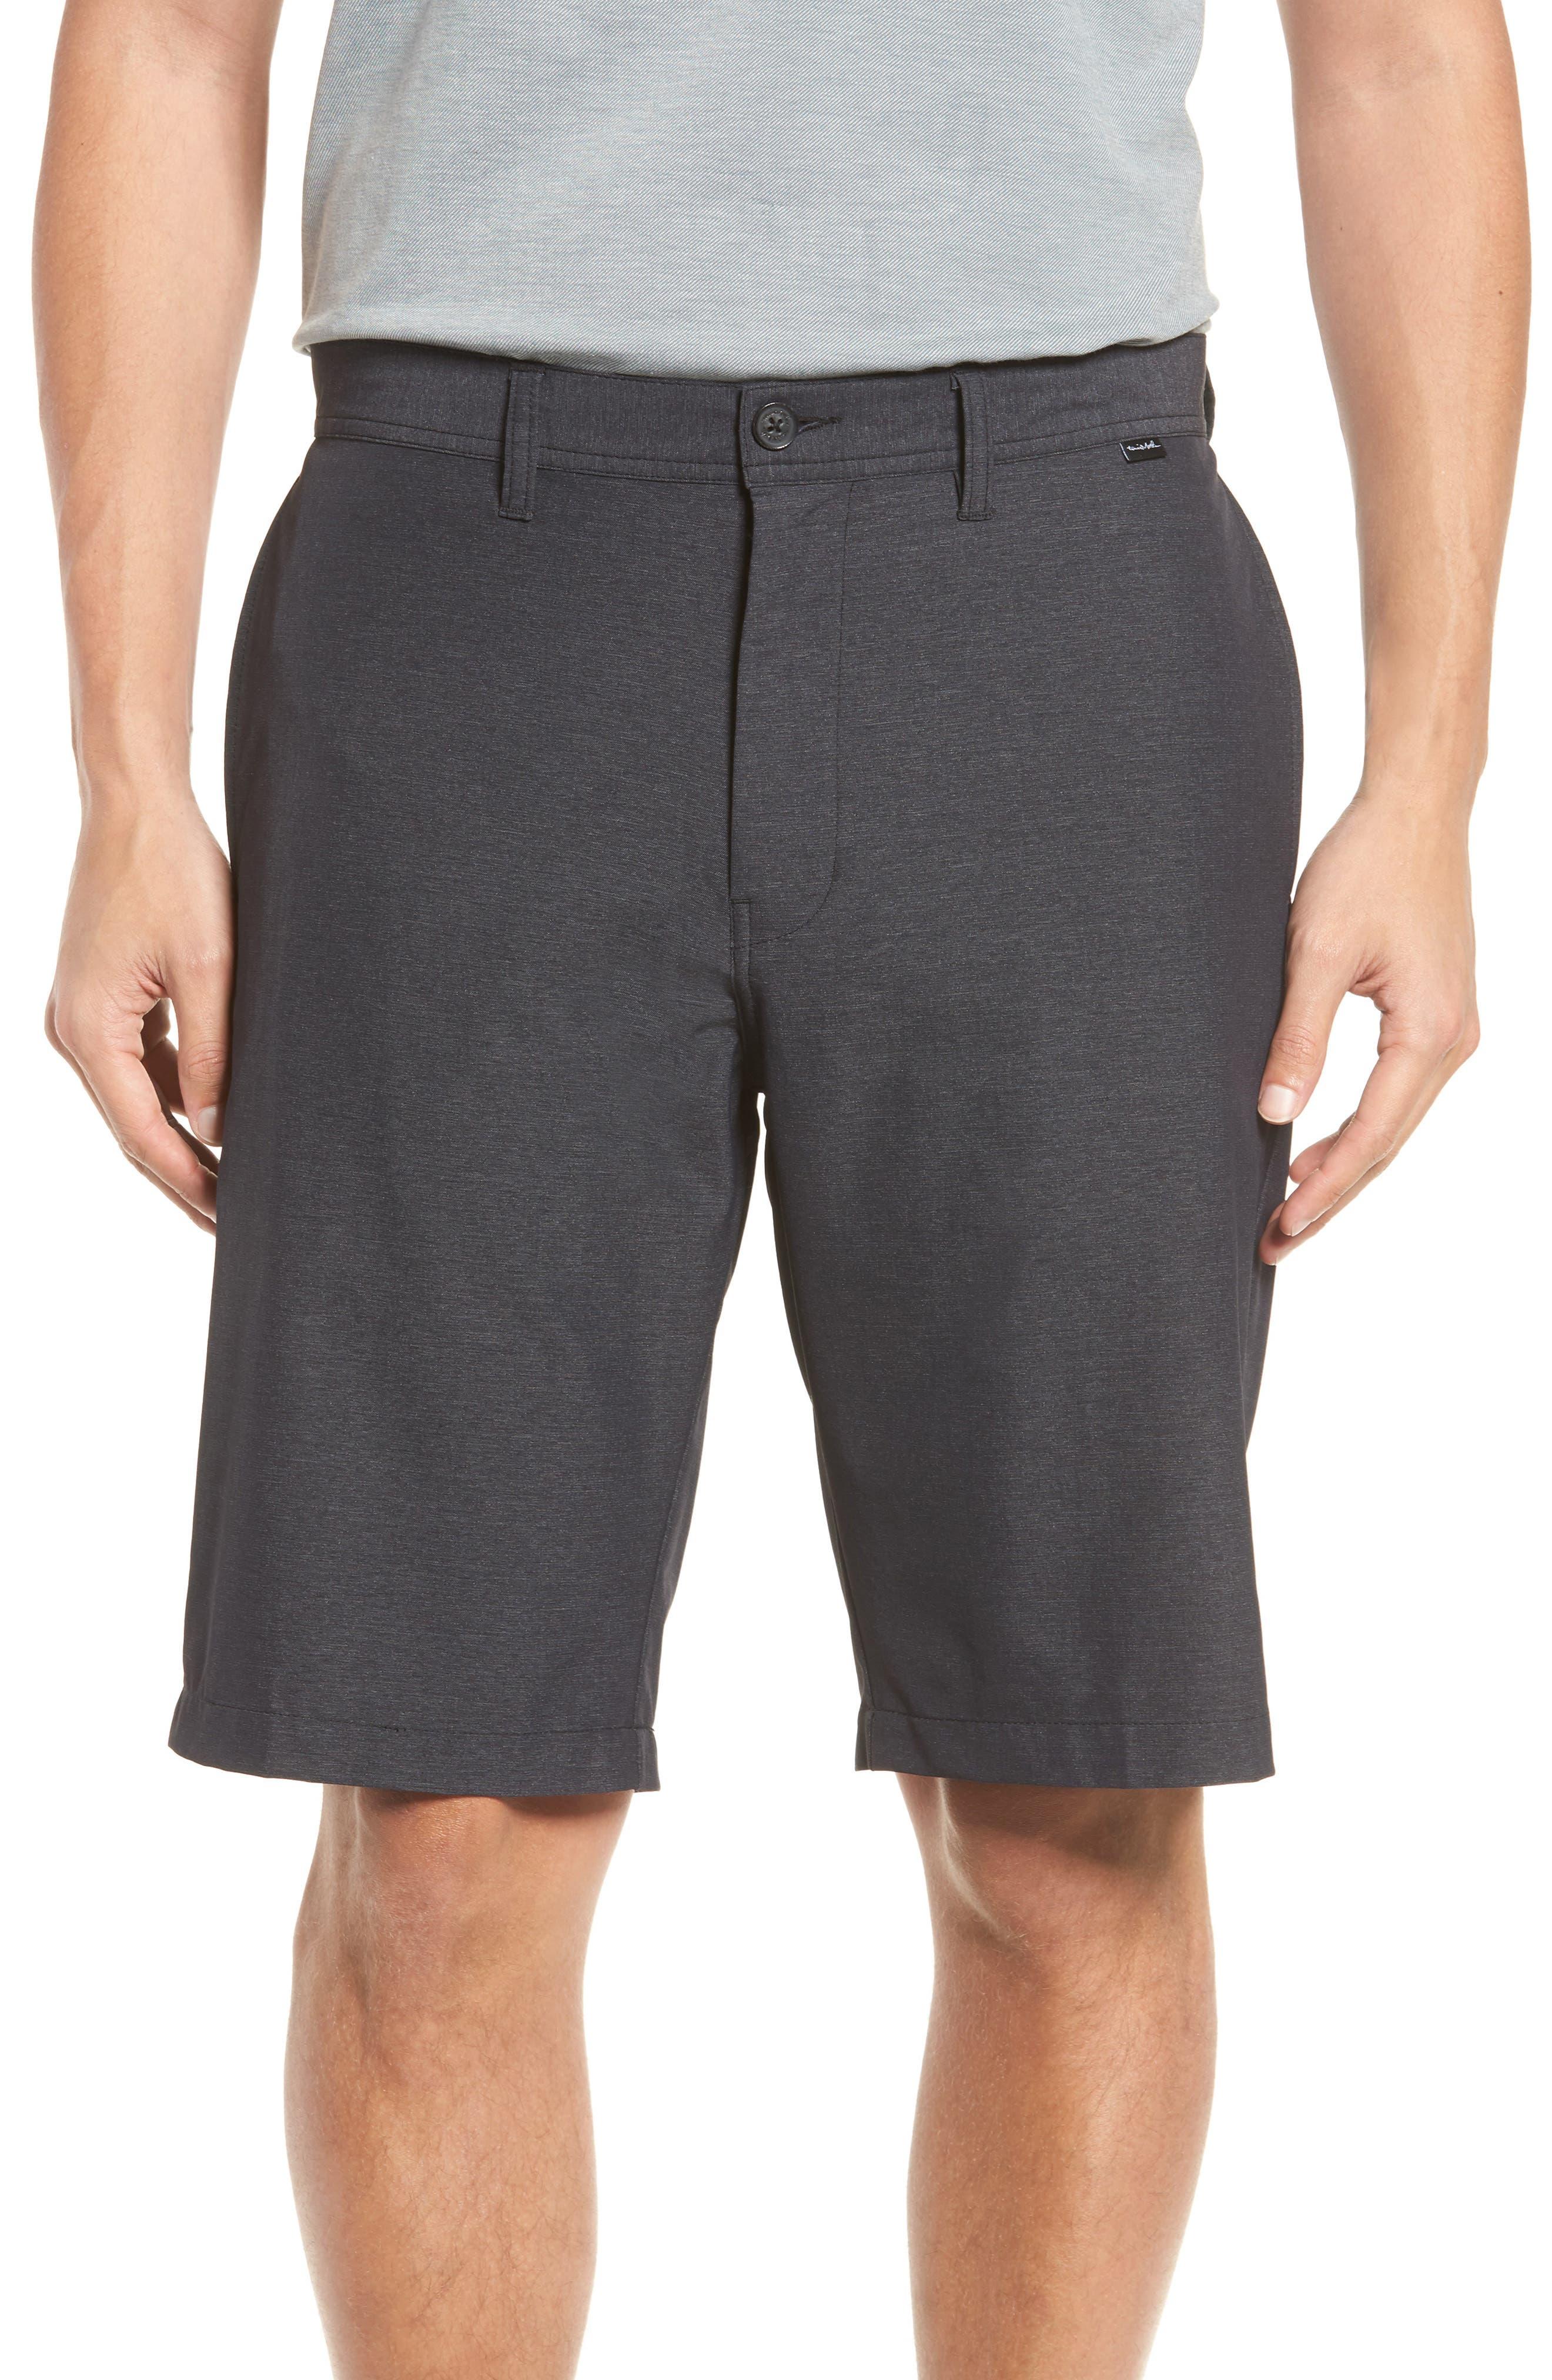 Travis Mathew Port O Shorts